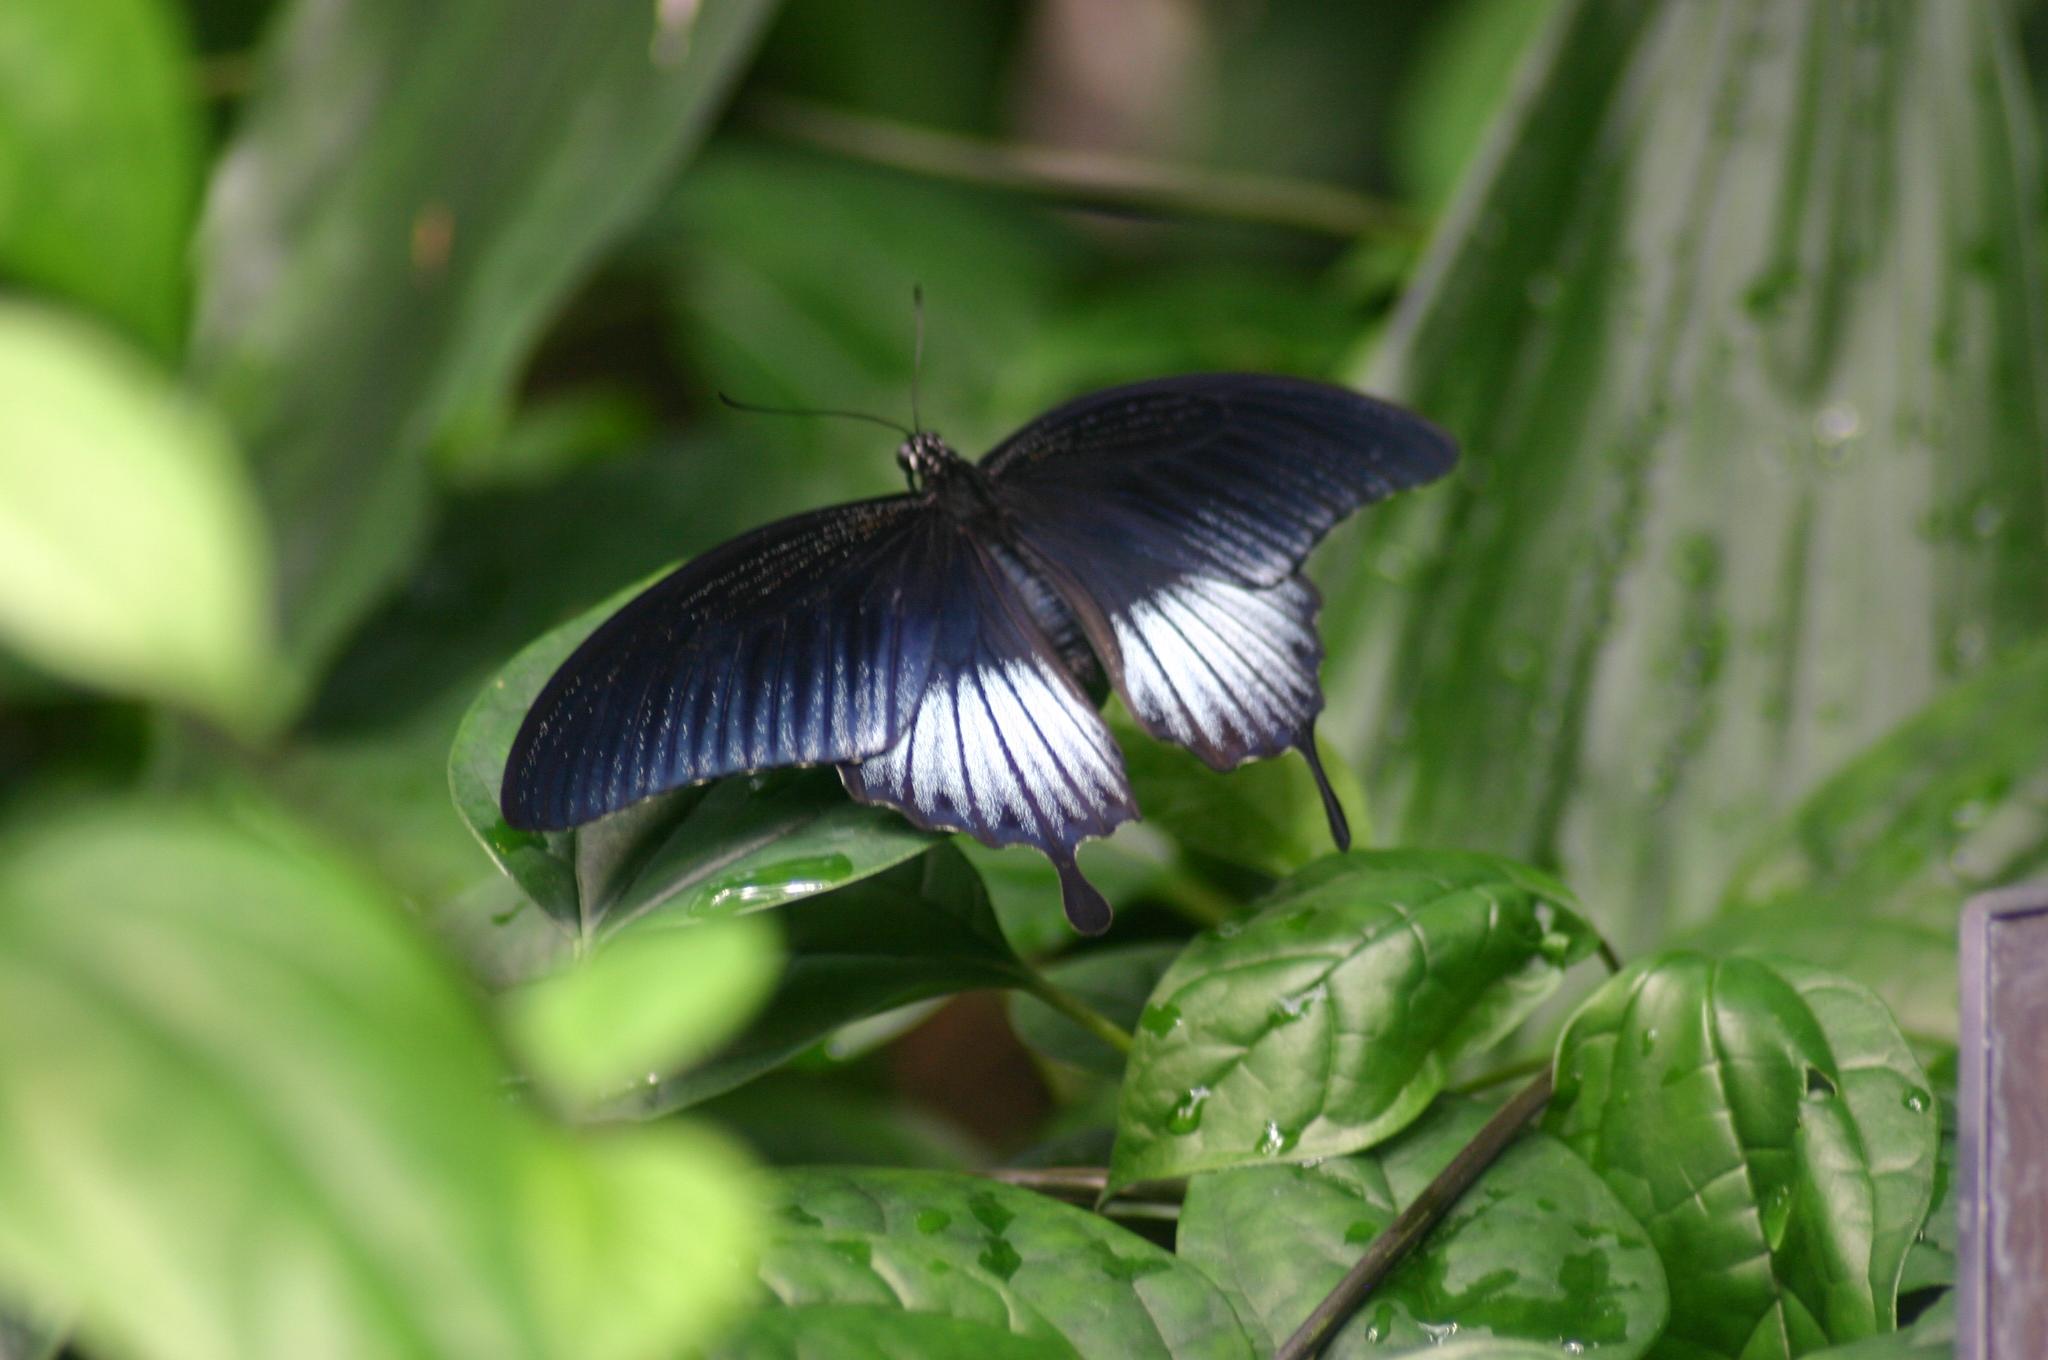 Best Kitchen Gallery: File Tropical Butterfly House Wikimedia Mons of Tropical Butterfly House  on rachelxblog.com